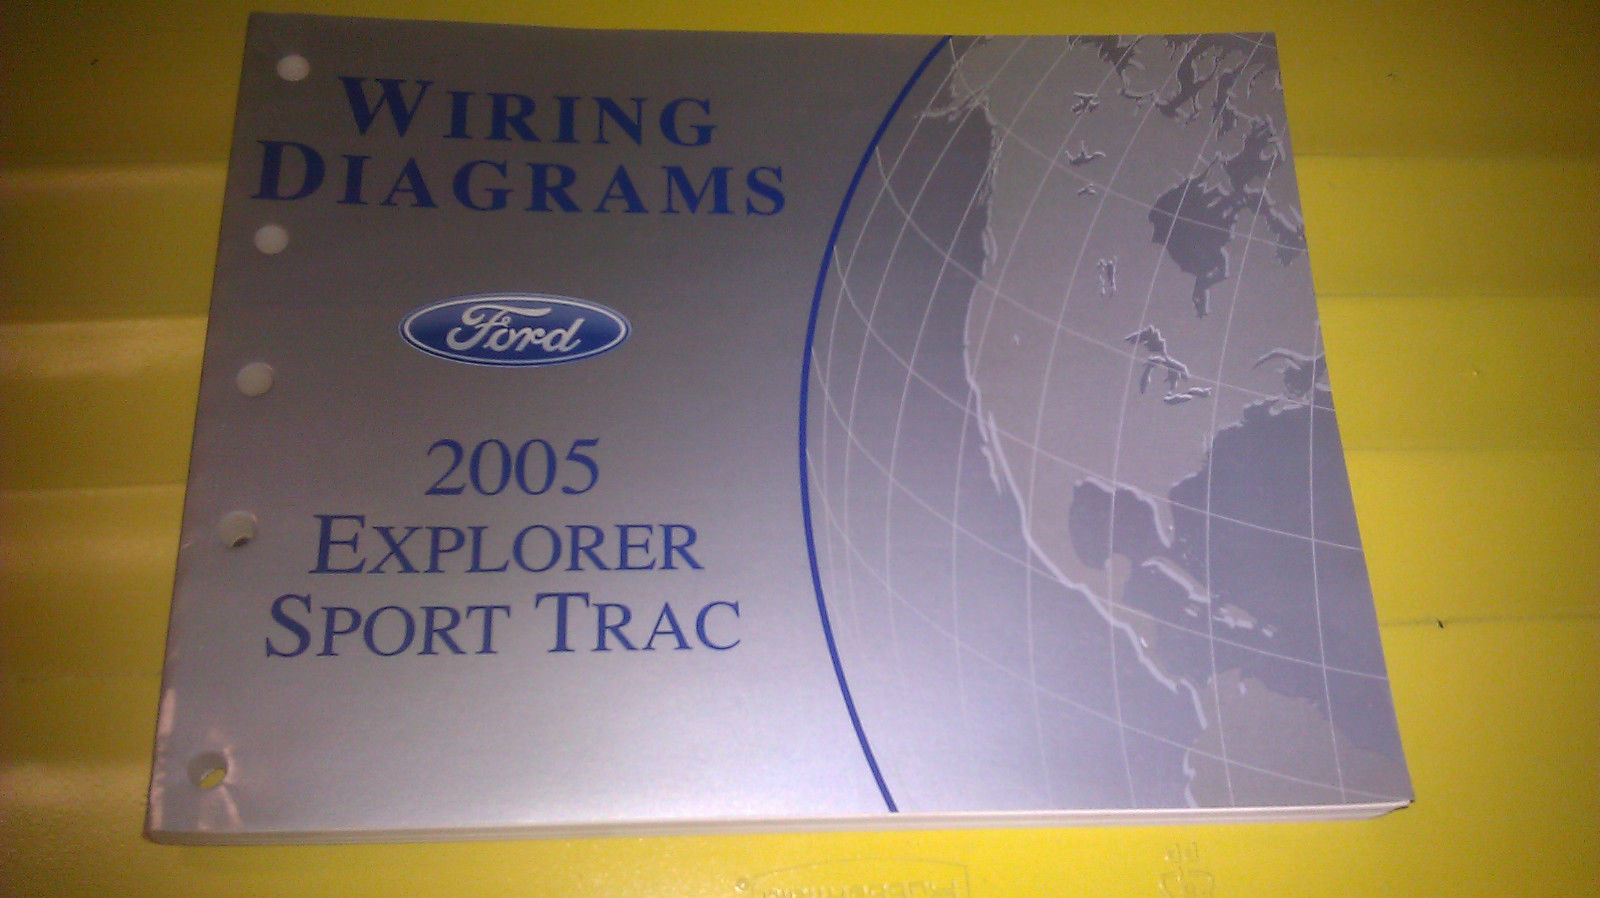 Ford Explorer Sport Trac Wiring Diagrams View Diagram Ford Explorer